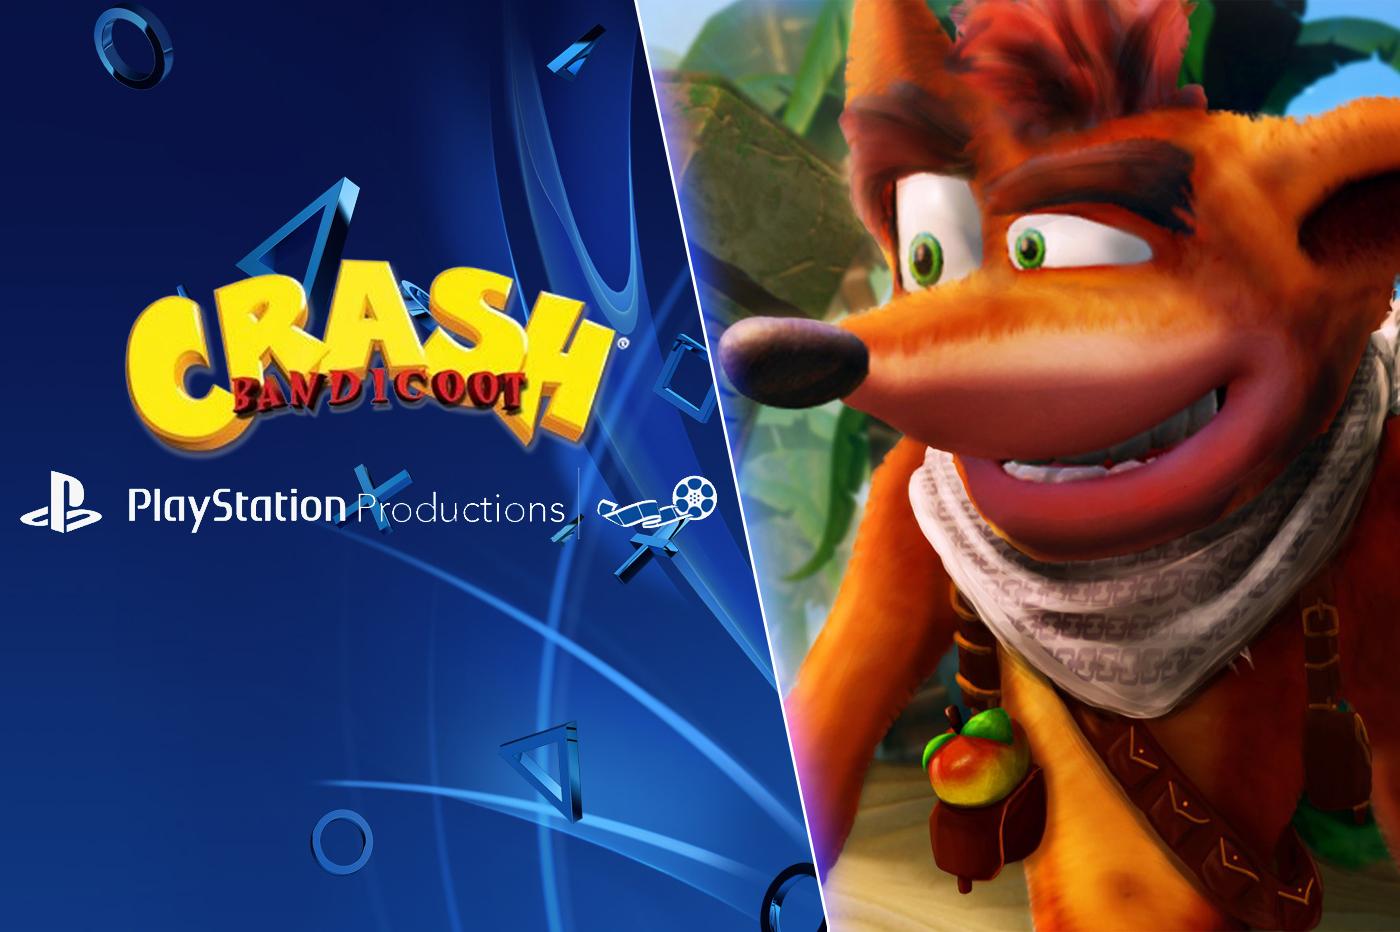 Crash Bandicoot Film Animation